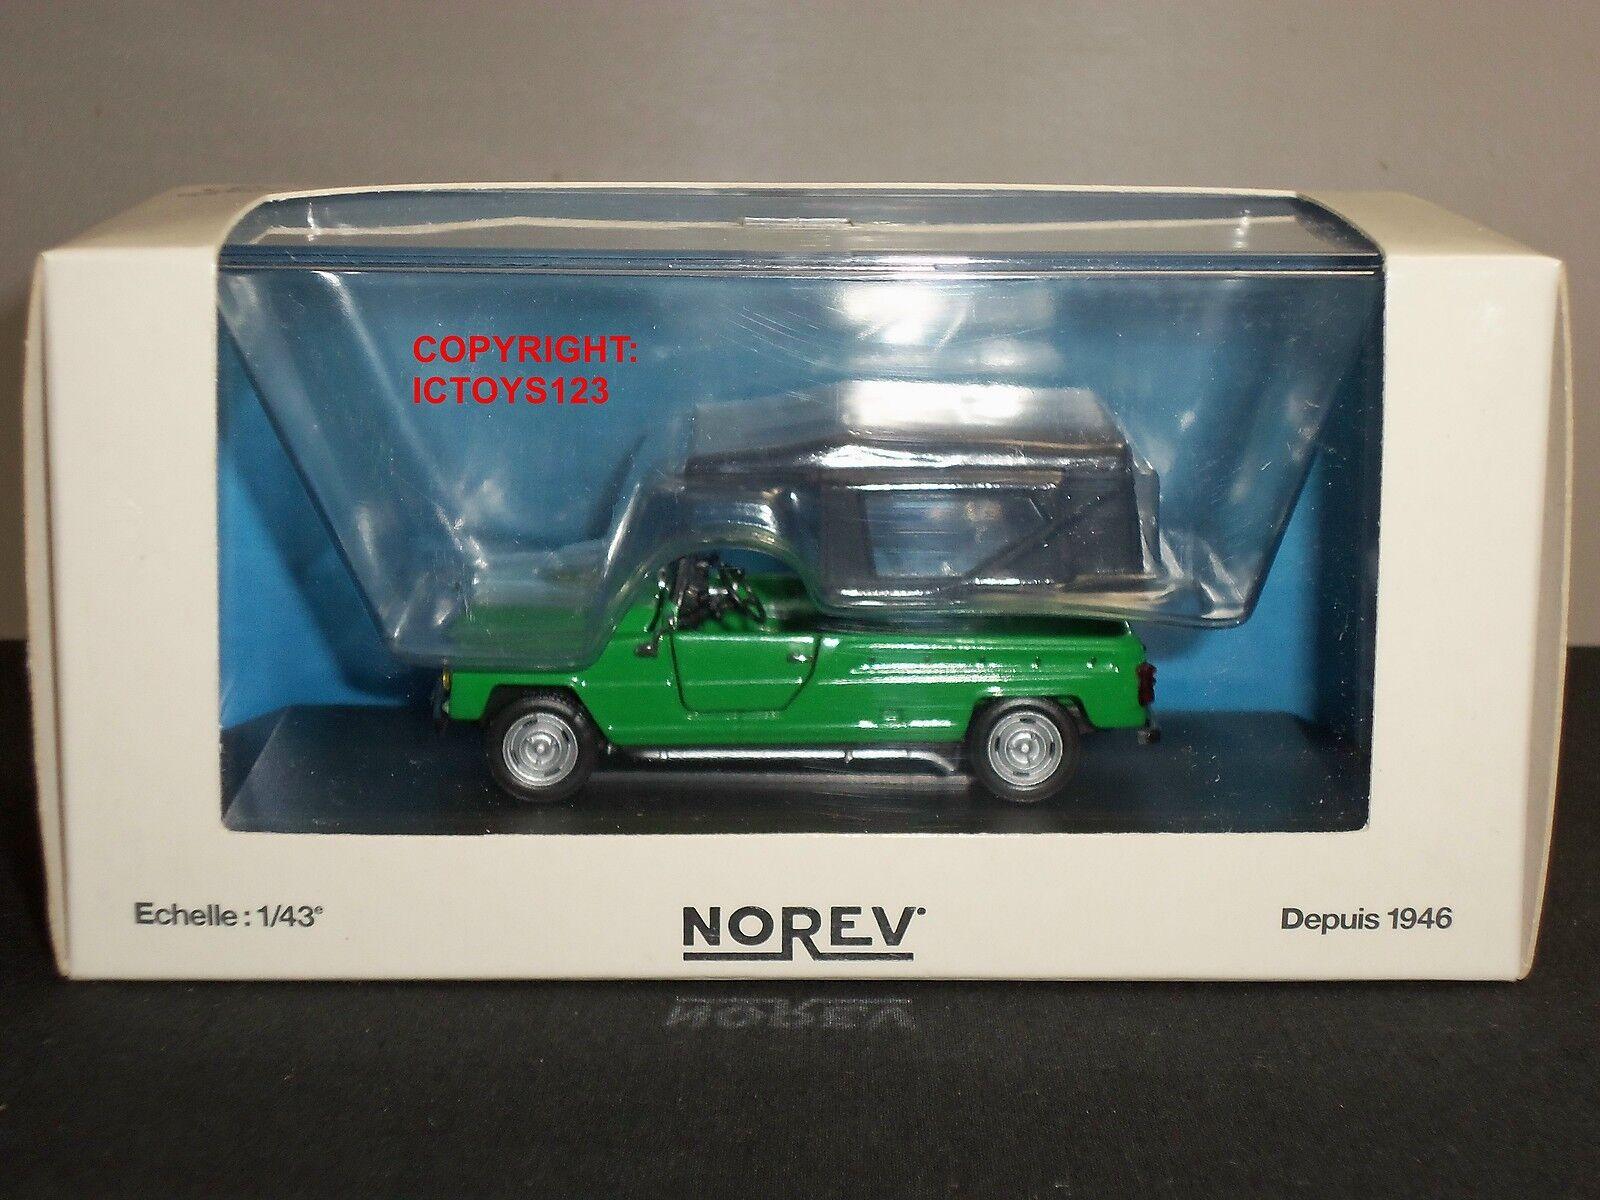 NOREV 510950 510950 510950 RENAULT RODEO GREEN DIECAST MODEL CAR 84895c